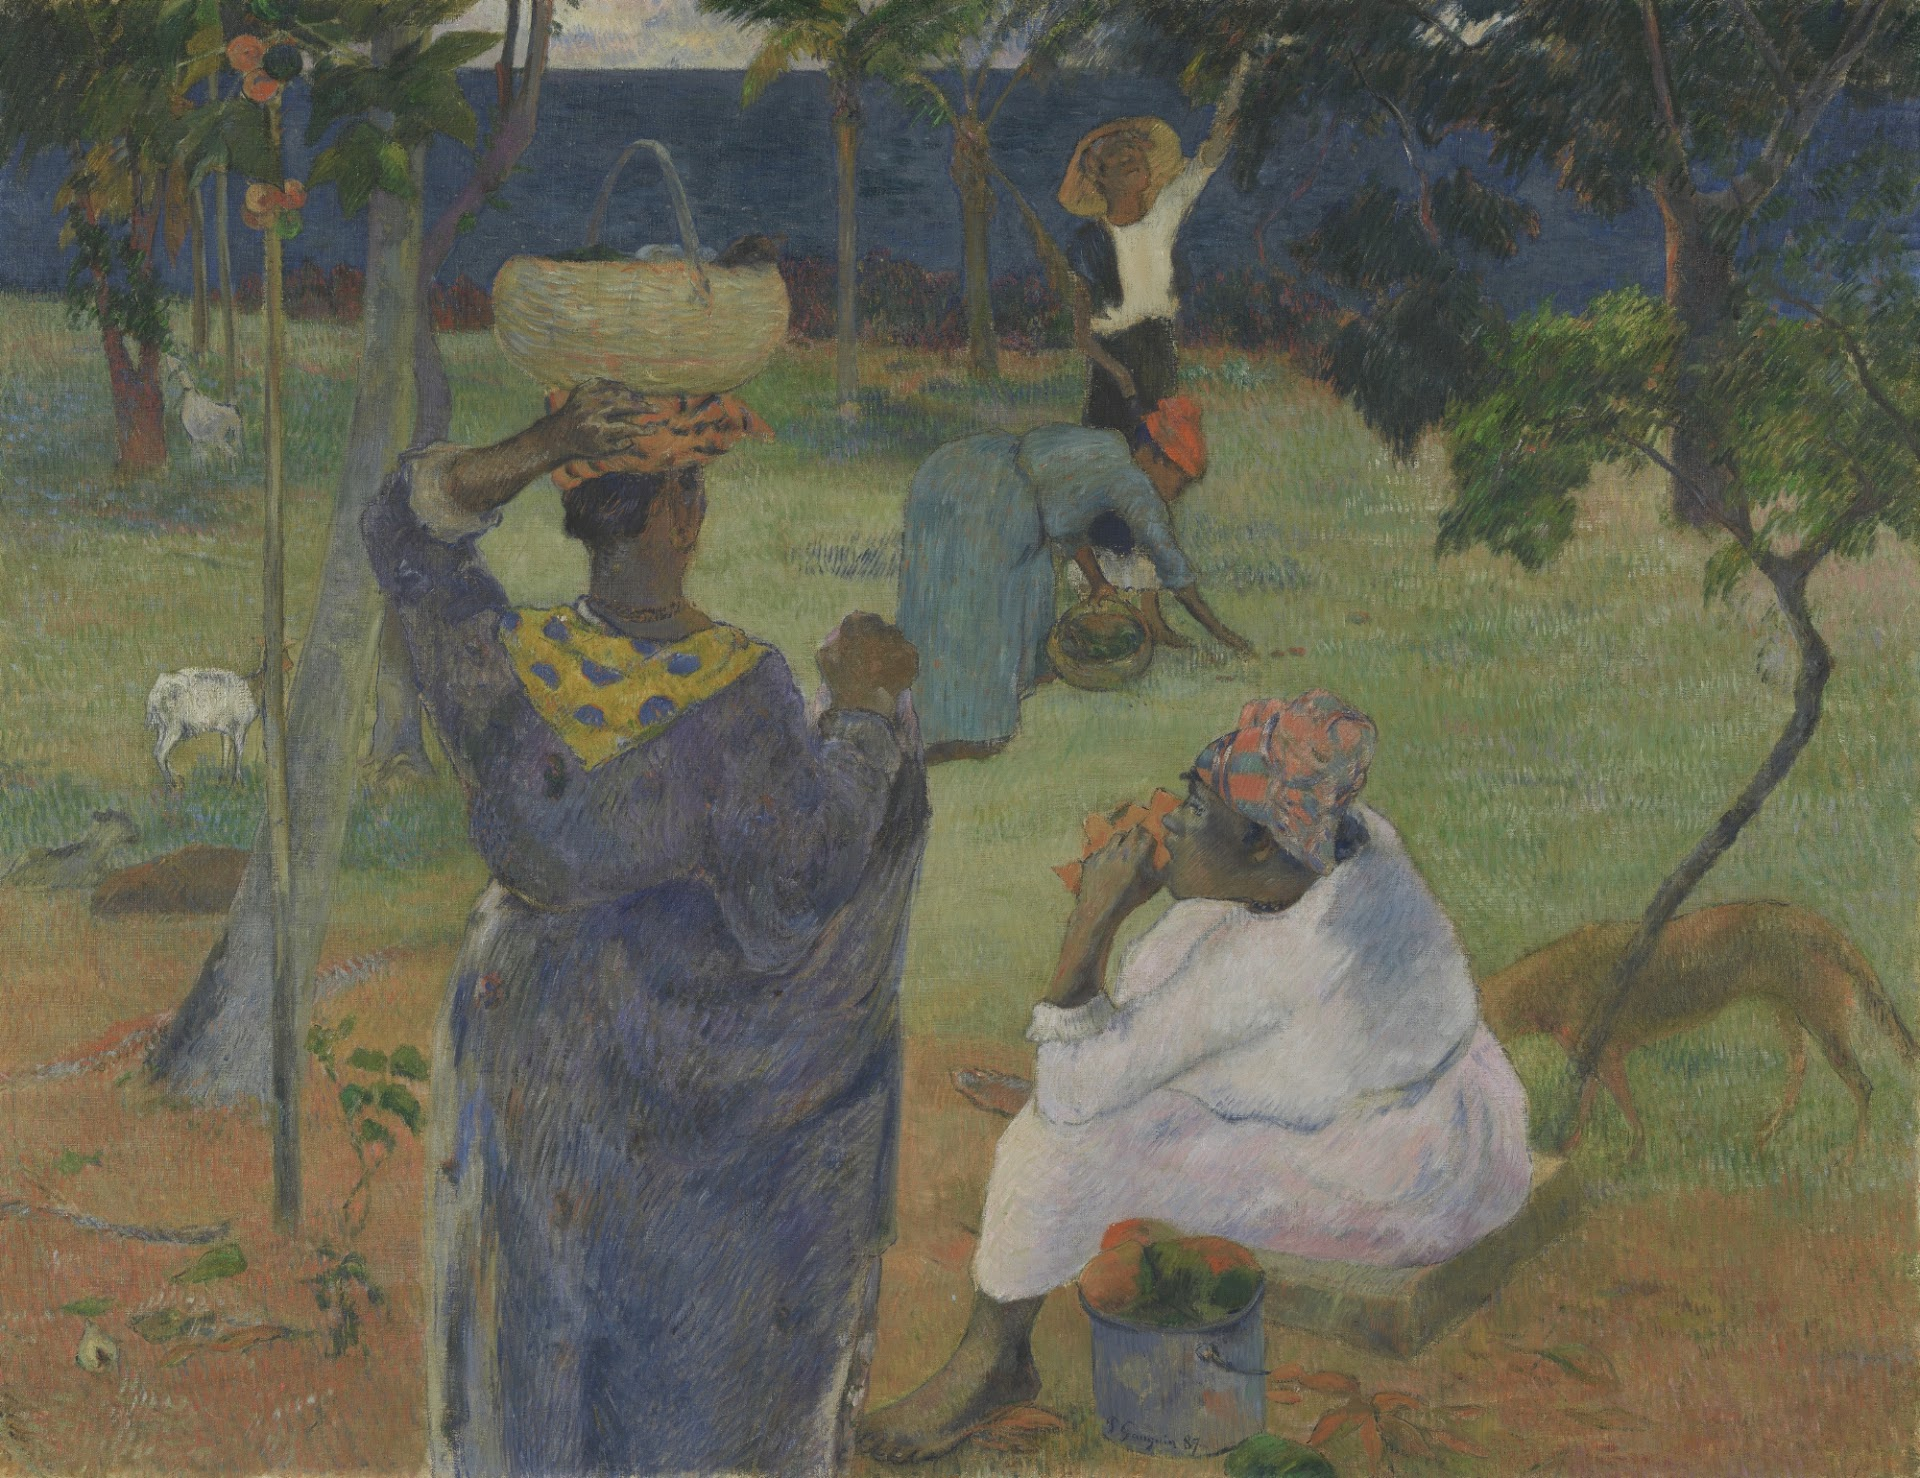 Paul Gauguin - Alberi di mango, Martinica, 1887 Van Gogh Museum, Amsterdam (Vincent van Gogh Foundation)